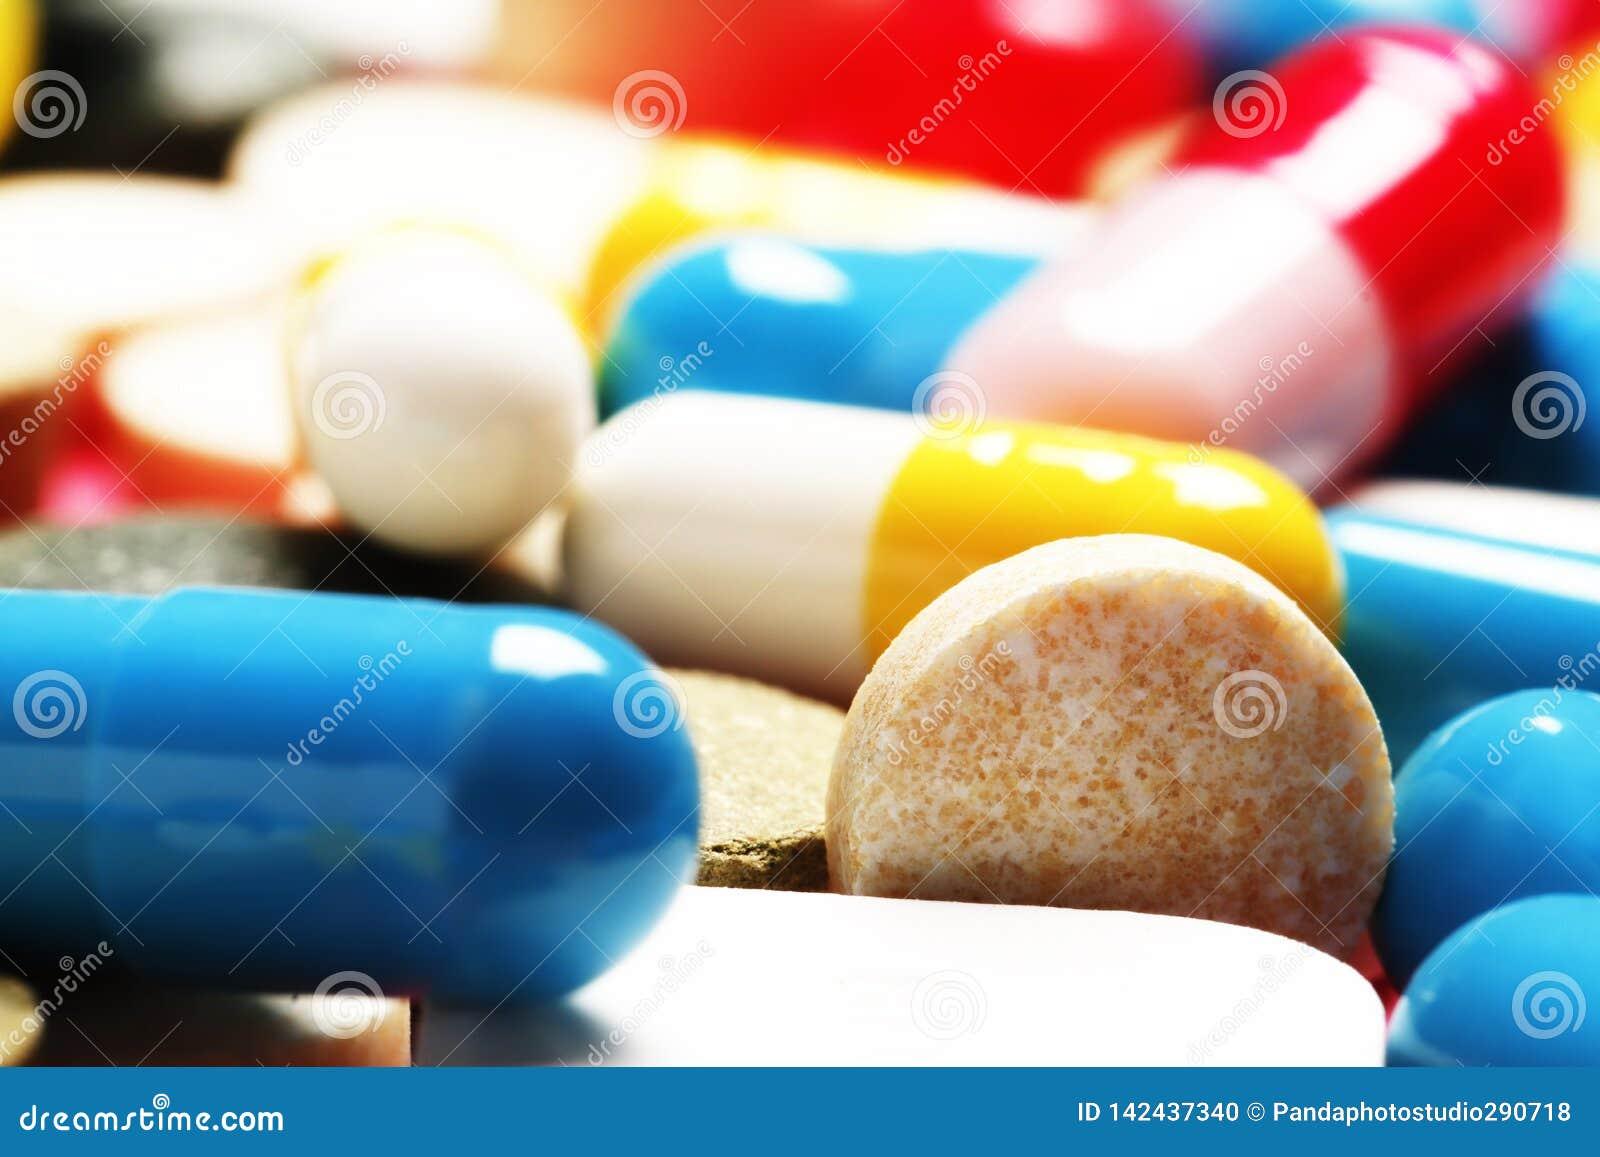 Píldoras como fondo Vitaminas y antibióticos